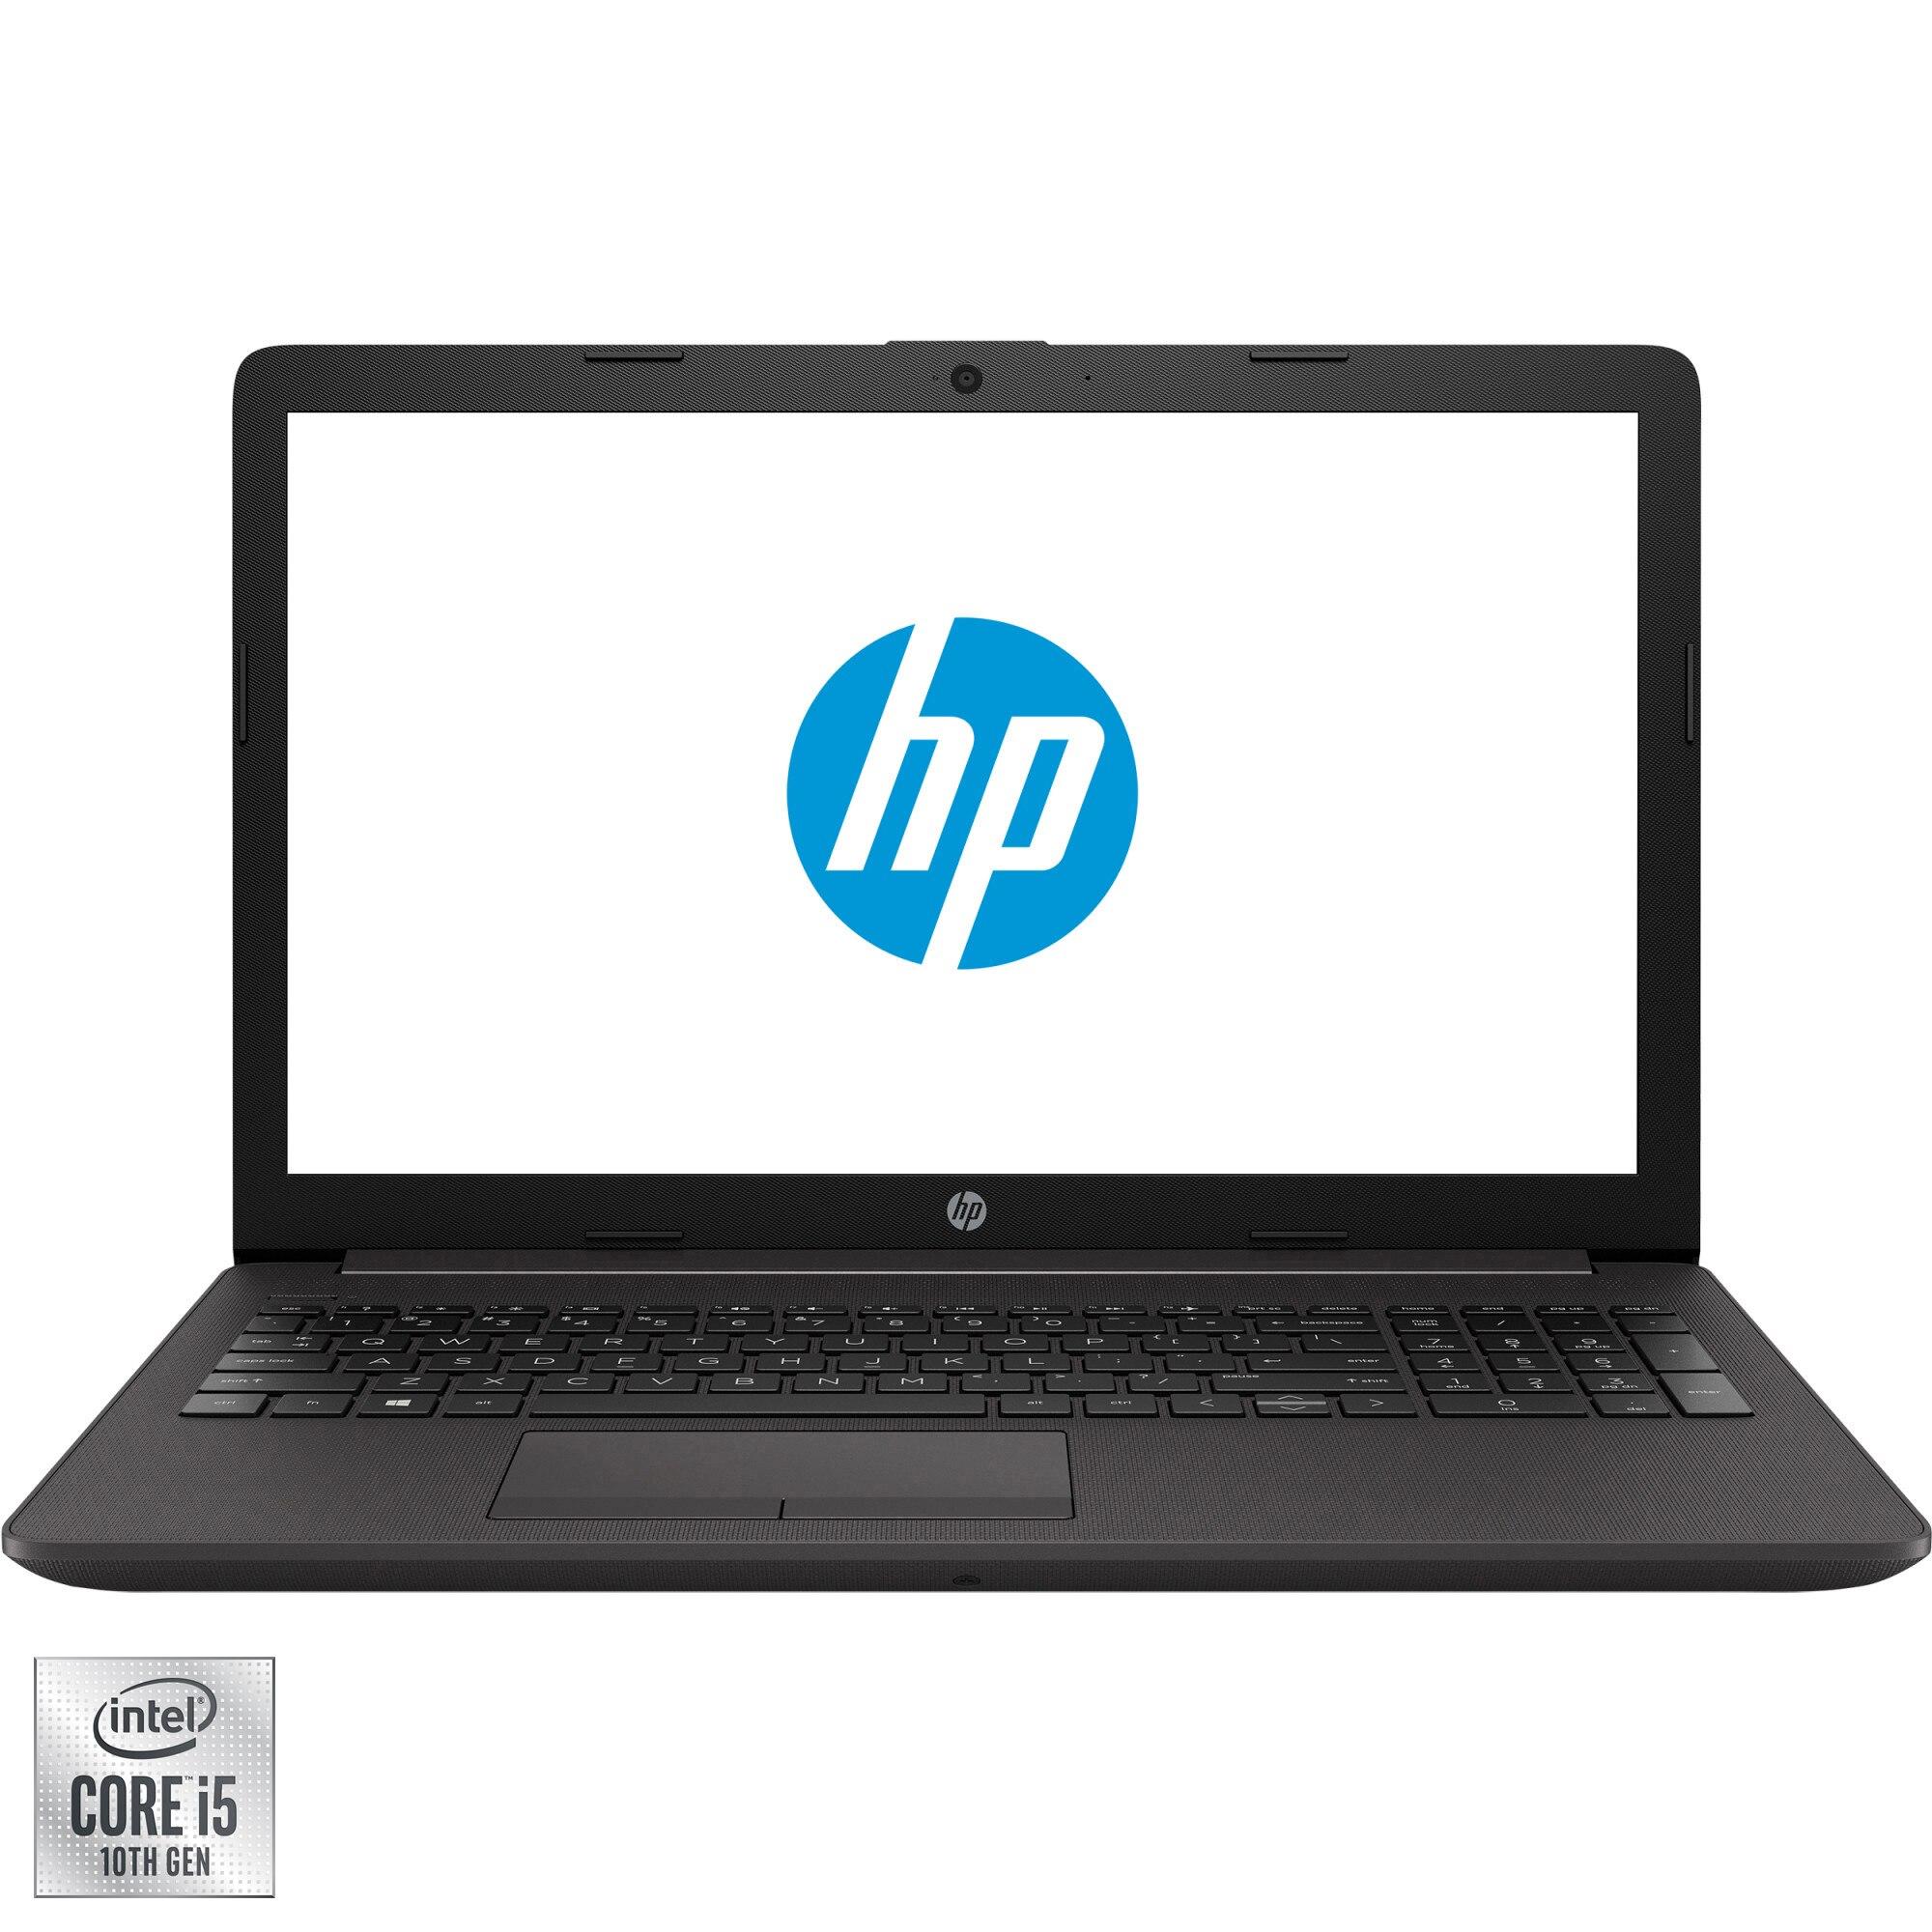 "Fotografie Laptop HP 250 G7 cu procesor Intel Core i5-1035G1 pana la 3.60 GHz, 15.6"", Full HD, 8GB, 256GB SSD, Intel UHD Graphics, Free DOS, Dark Ash Silver"